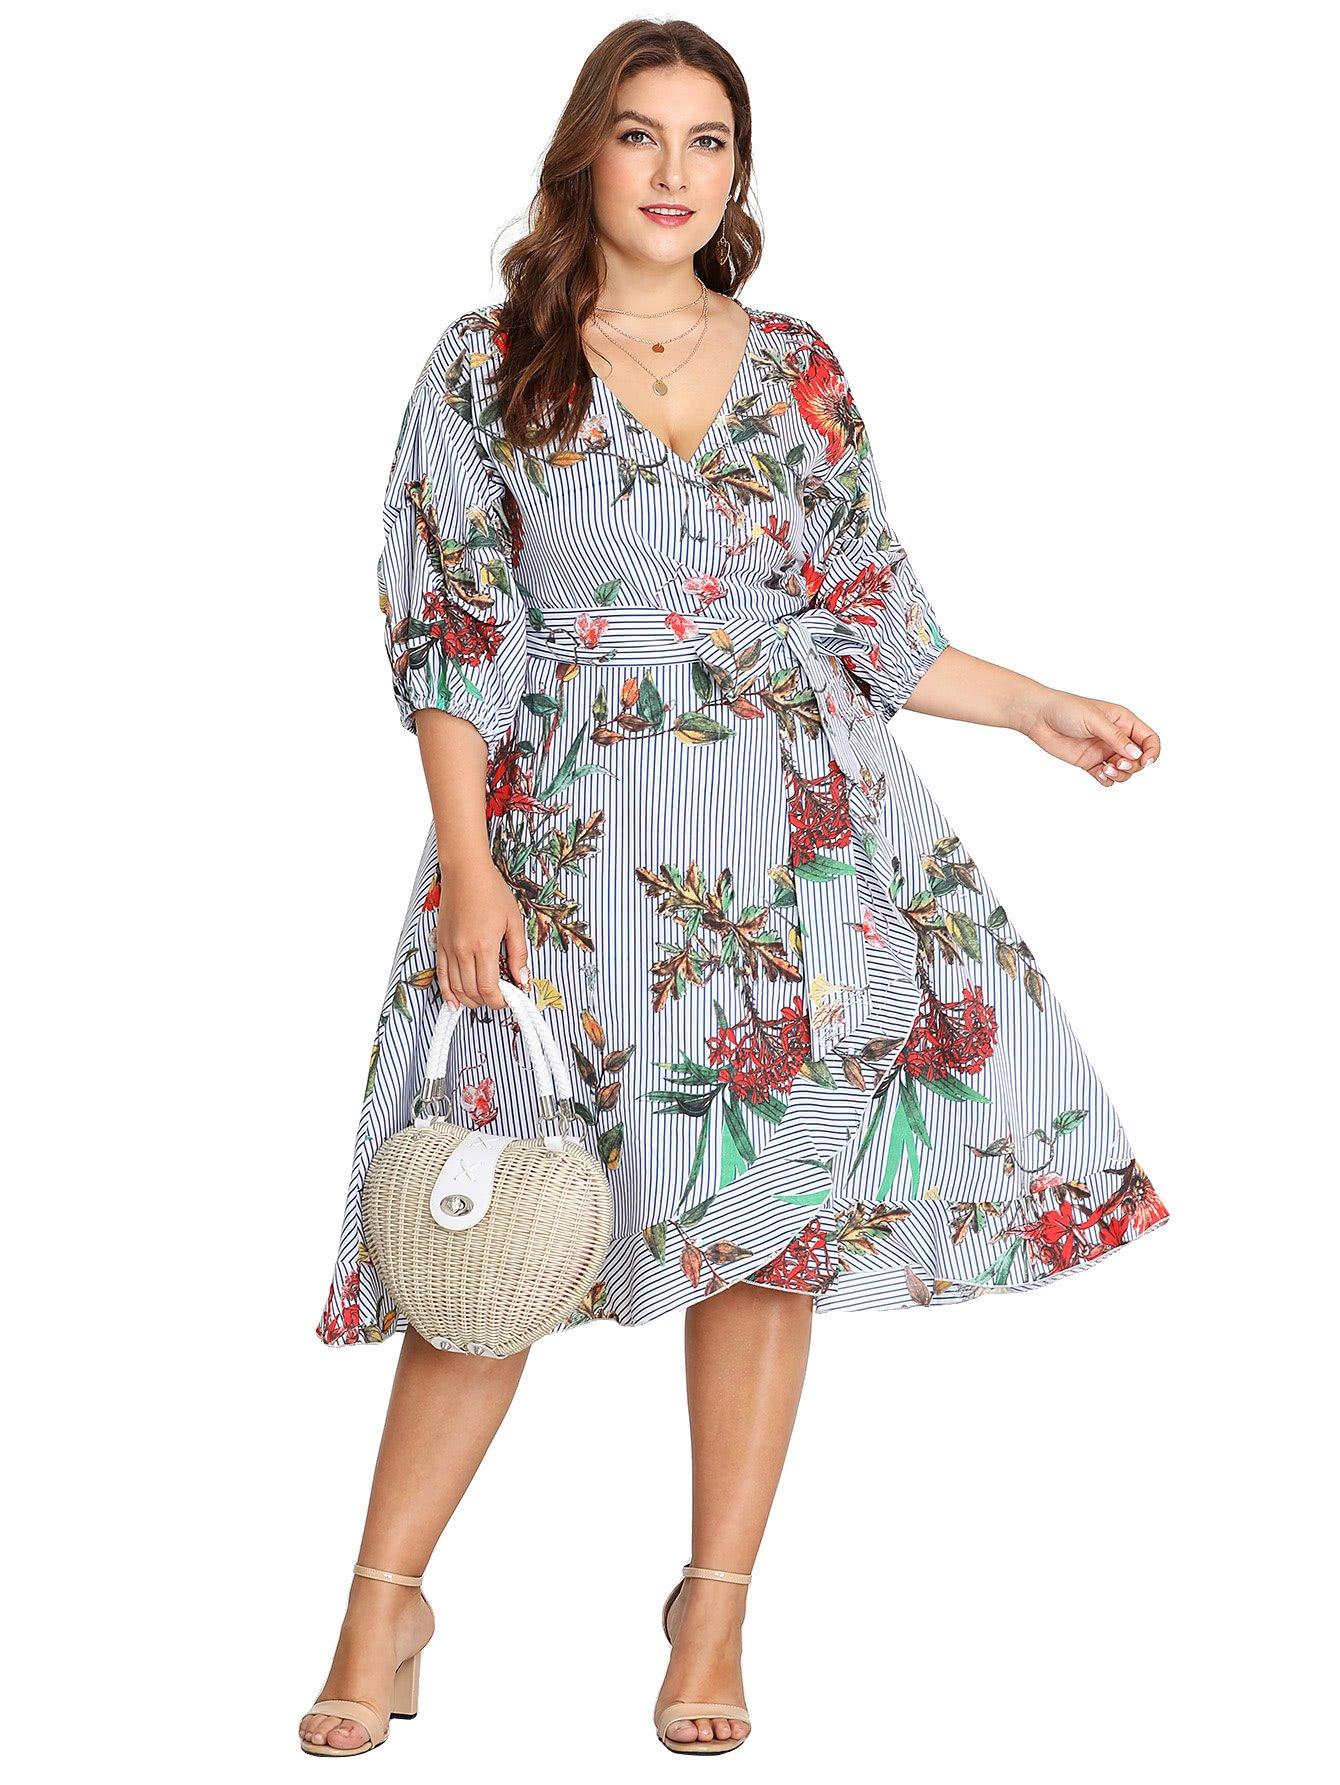 Milumia Plus Size Summer Wrap V Neck Chiffon 3 4 Sleeves Casual Party Midi Dress Floral Print